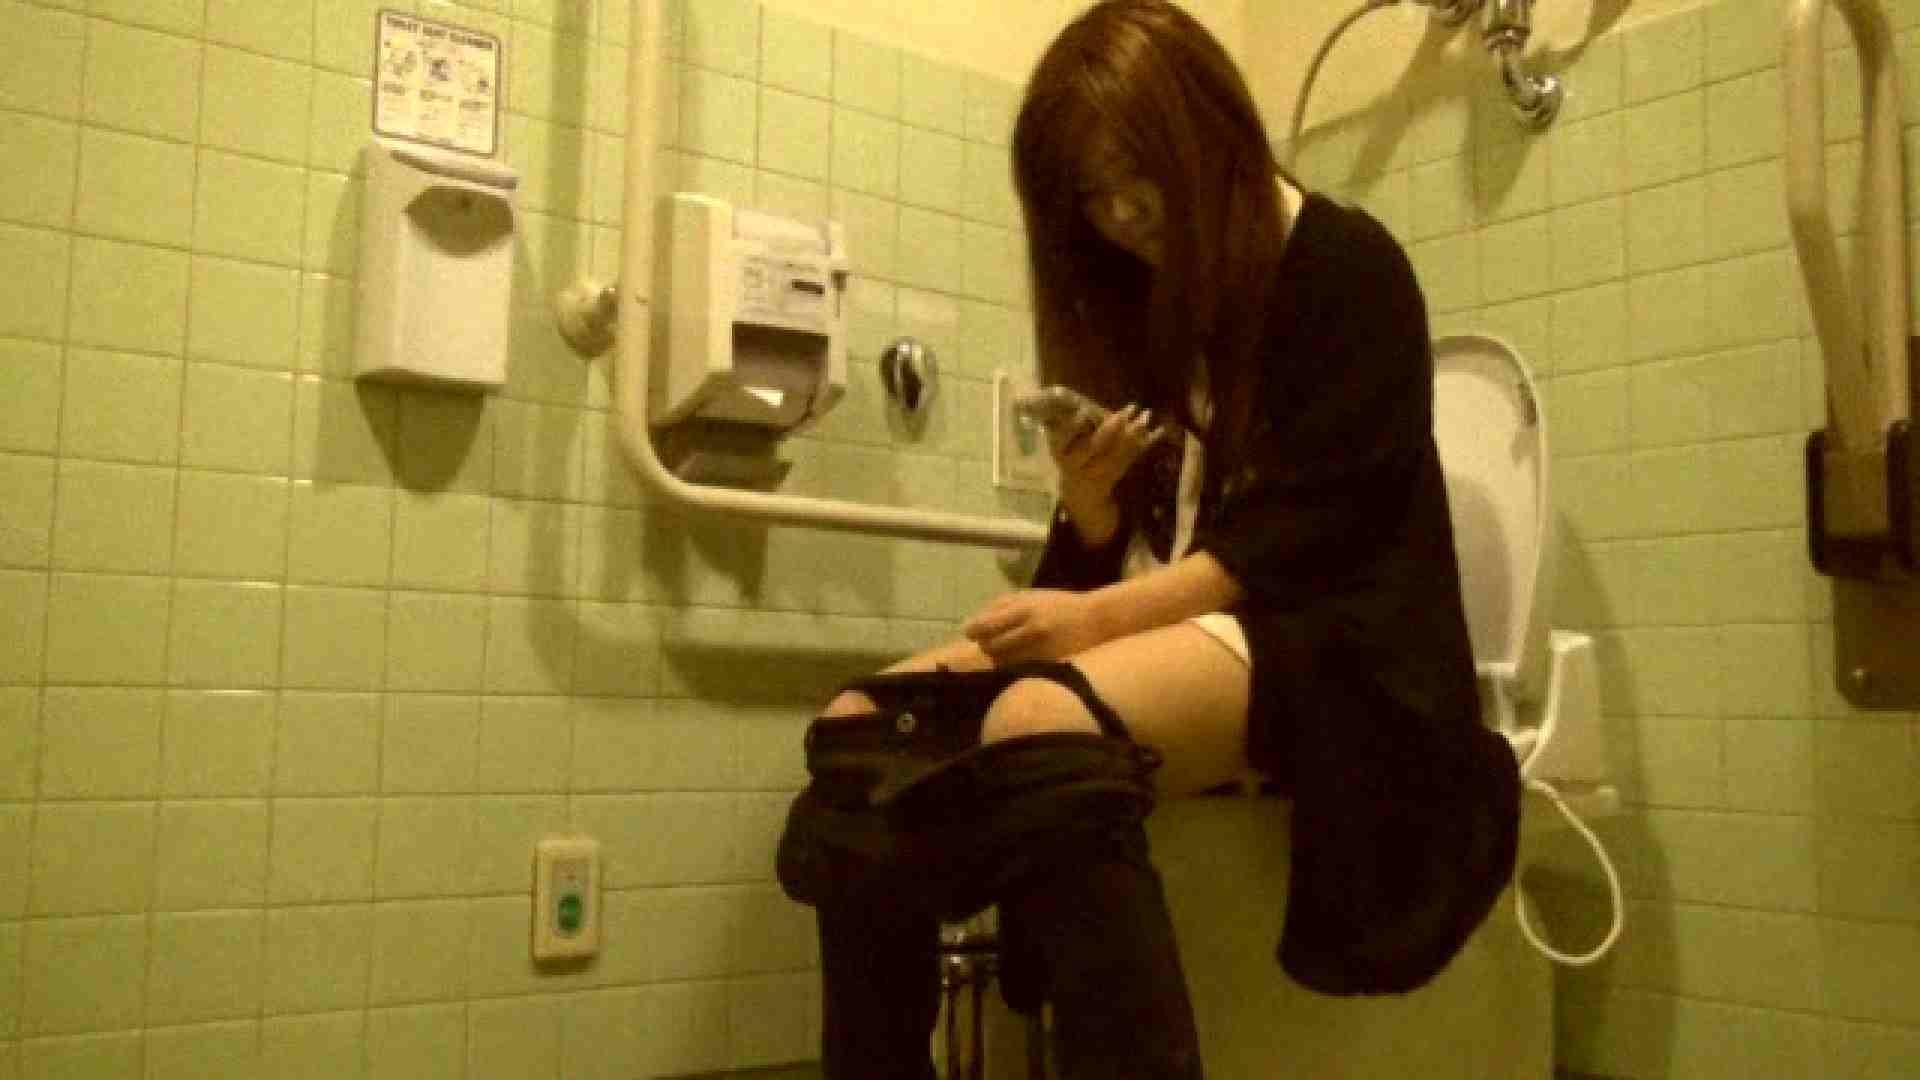 vol.26 【SKちゃん(洗面所)】ガールズバー店員 19歳 キャバ嬢  72PIX 52